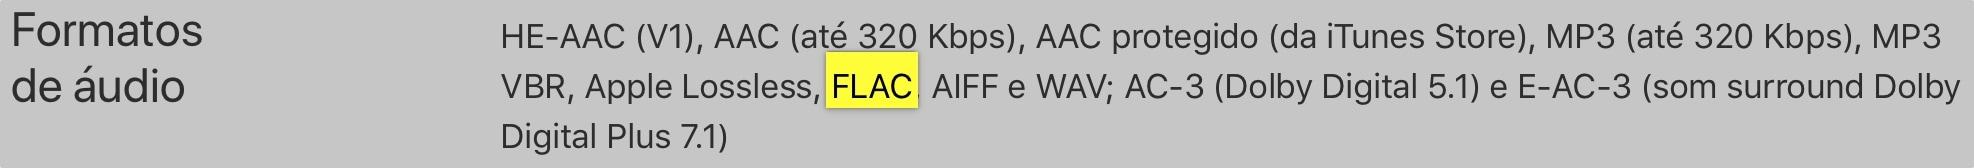 Suporte a arquivos FLAC na Apple TV 4K